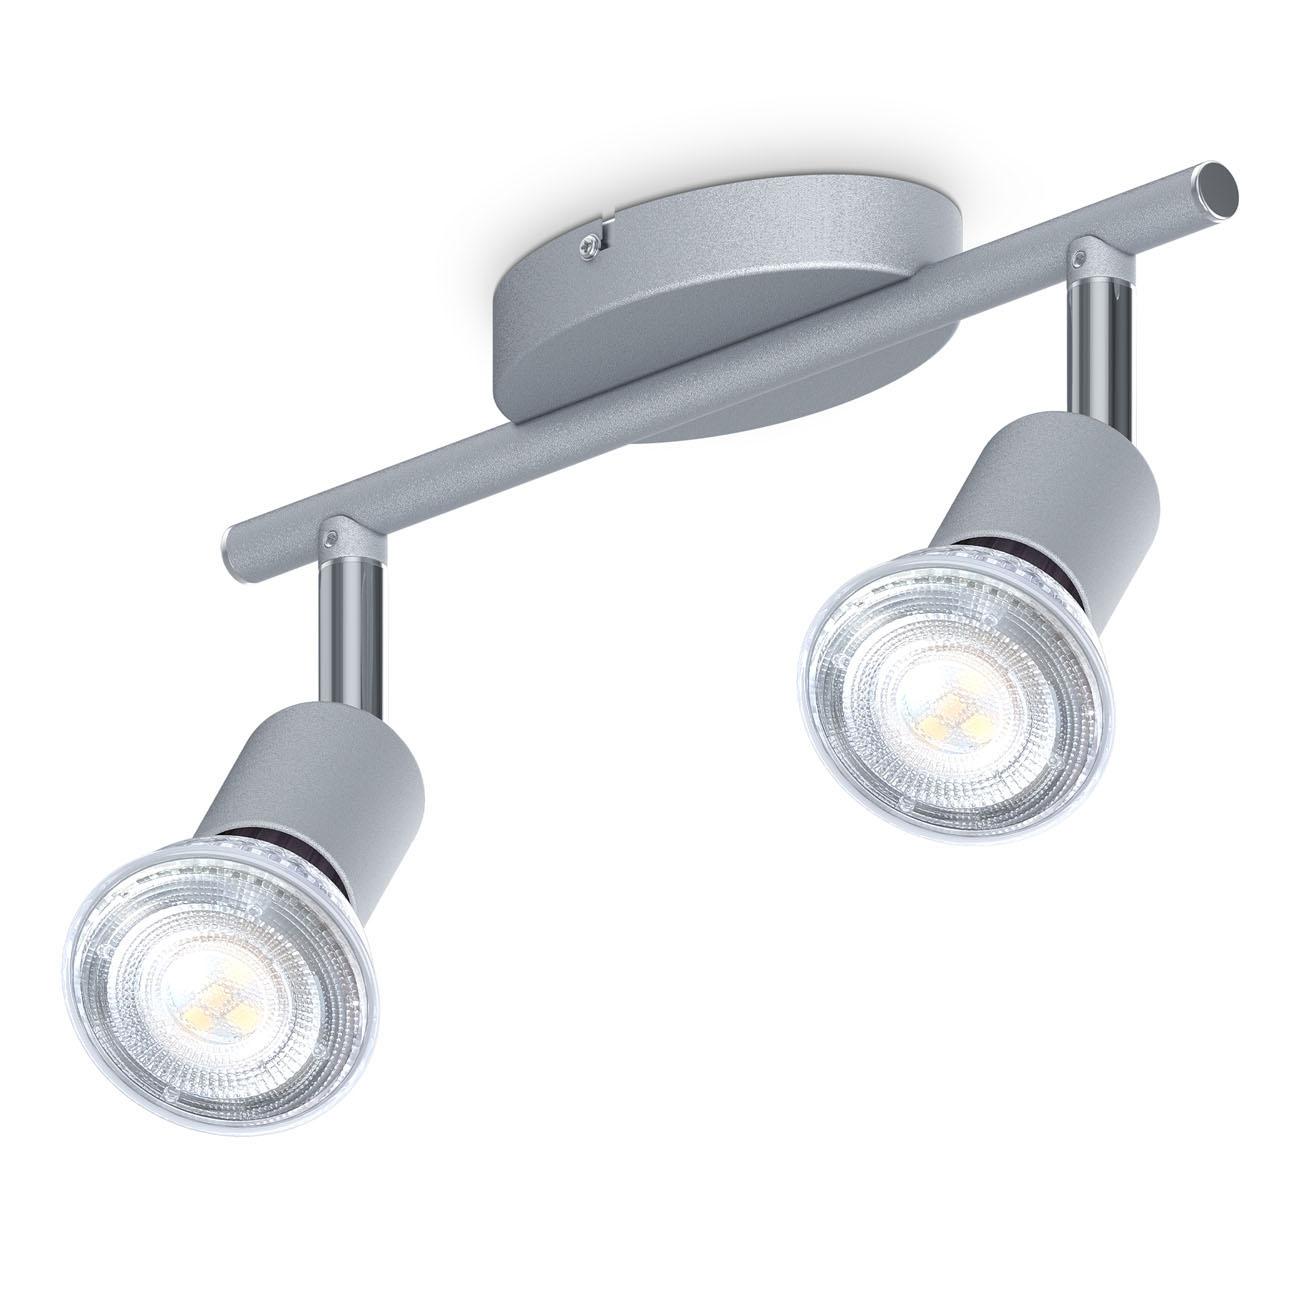 LED Deckenstrahler Spotleucht 2-flammig GU10 titan